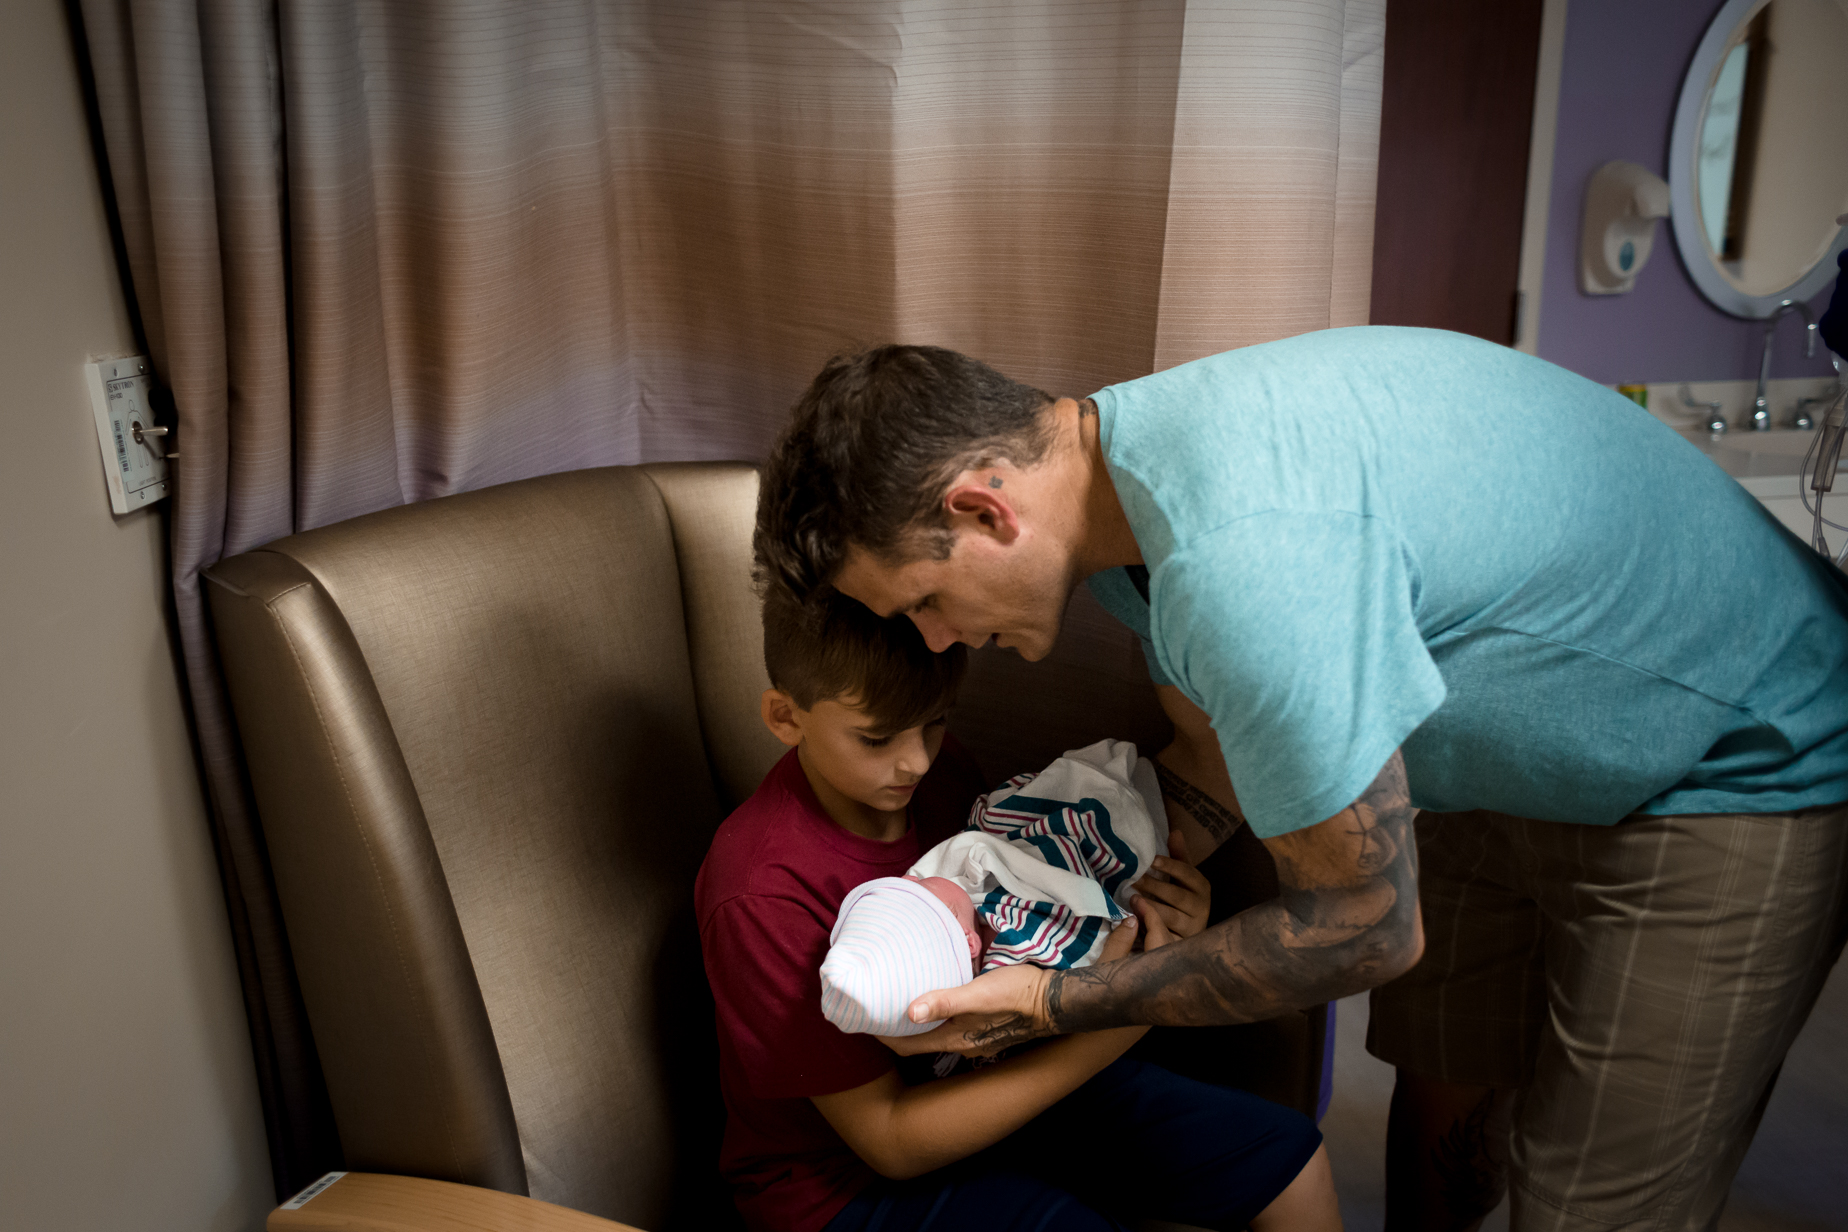 west-boca-hospital-gentle-c-section-epidural-vbac-home-birth-mary-harris-palms-birth-house-center-27.jpg